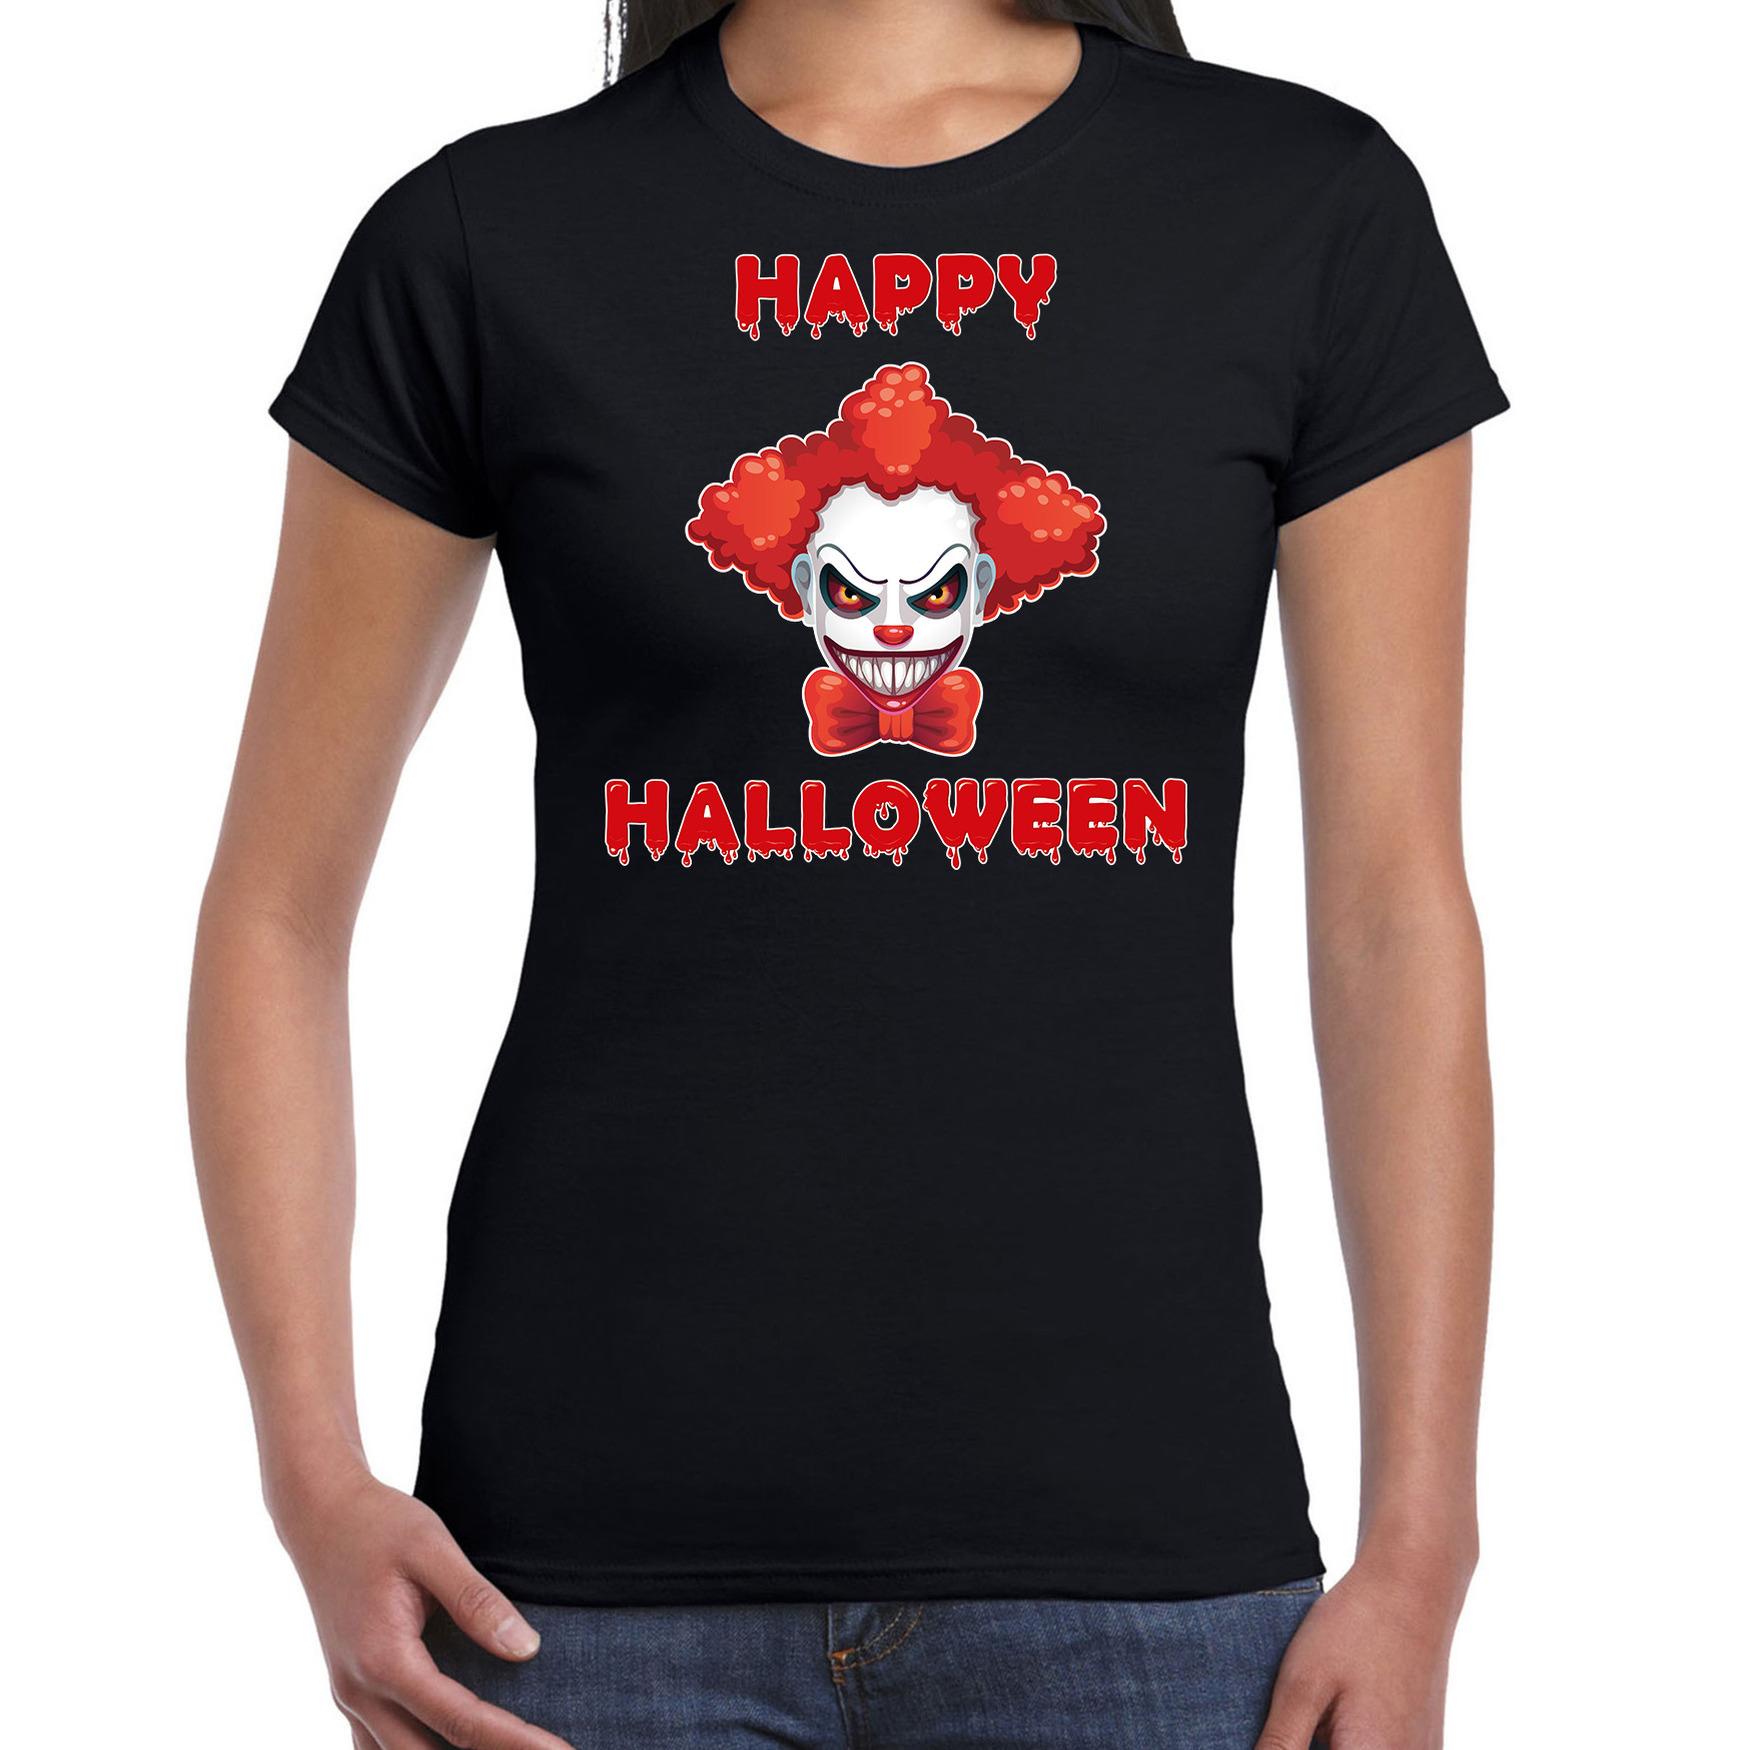 Halloween clown rood horror shirt zwart voor dames